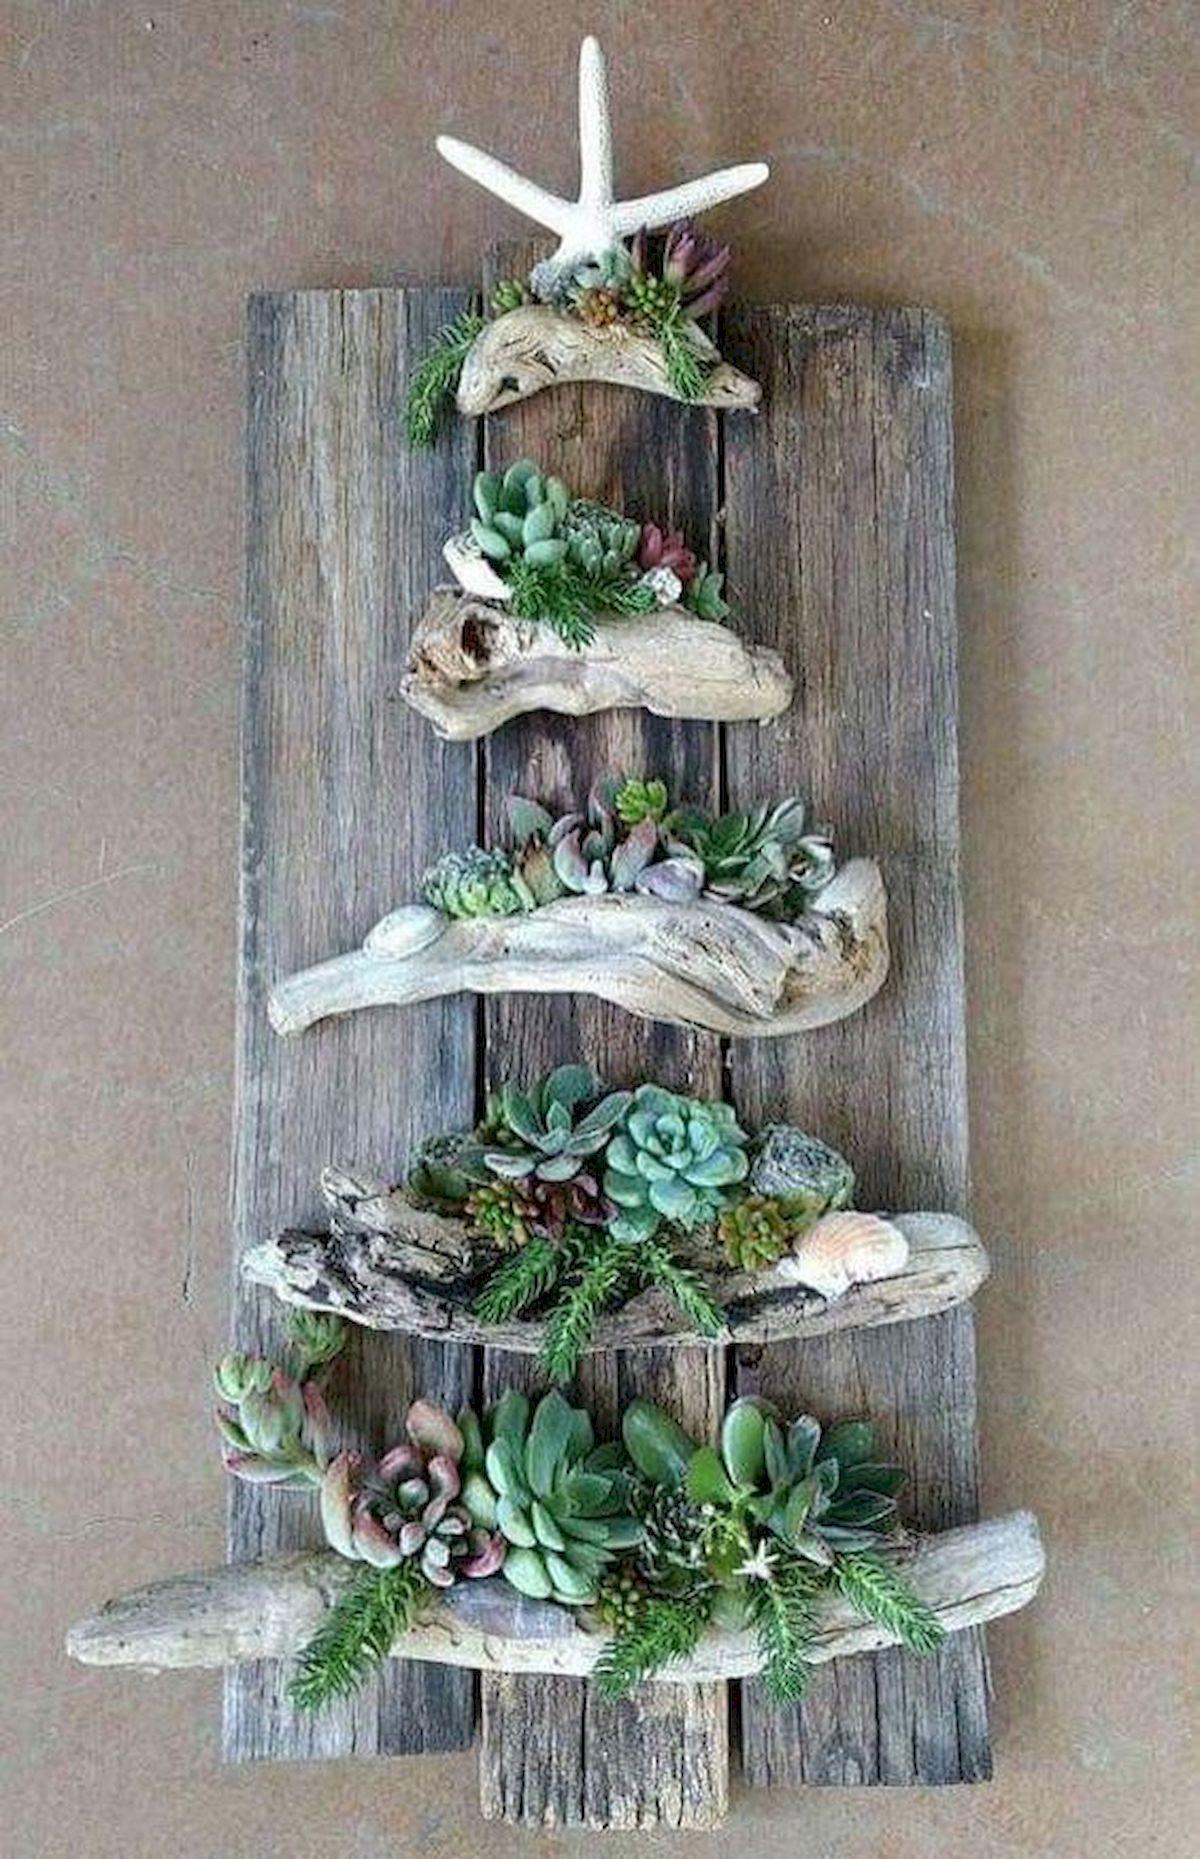 Outdoor Succulent Wall Garden Ideas